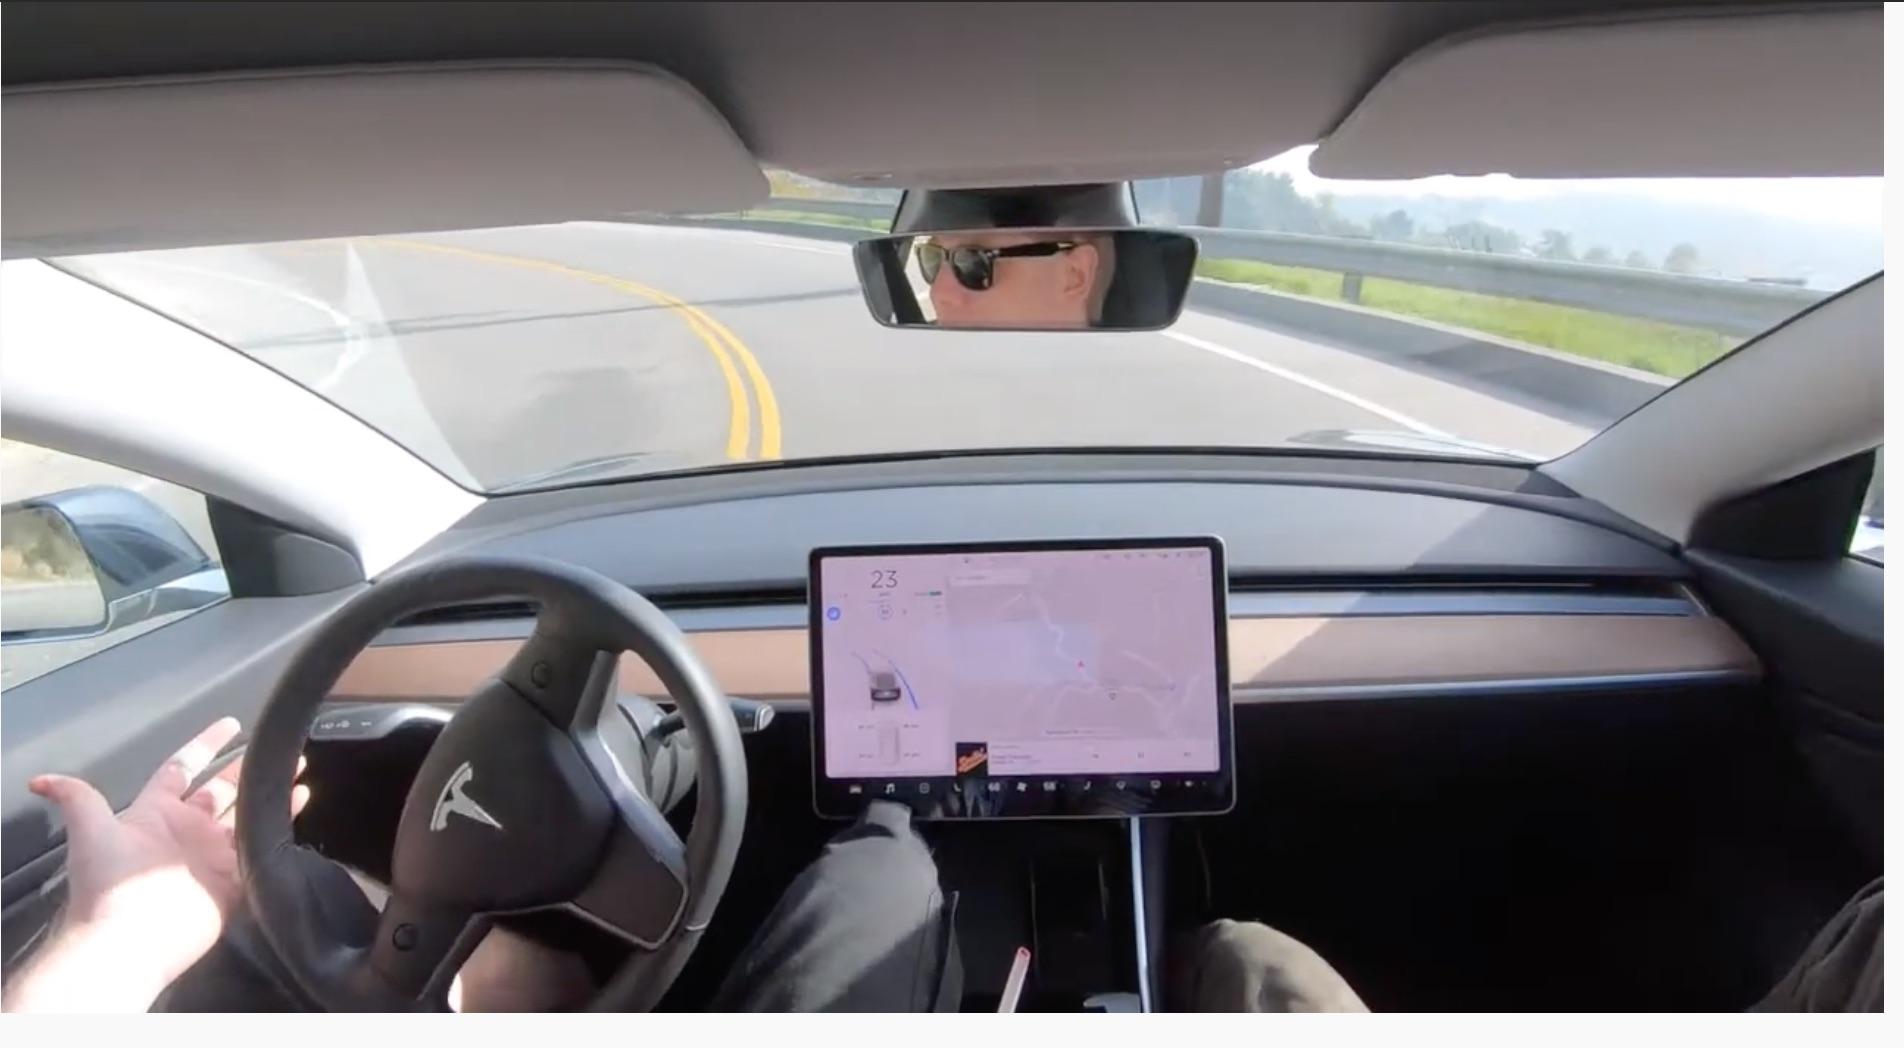 tesla autopoilot mulholland drive